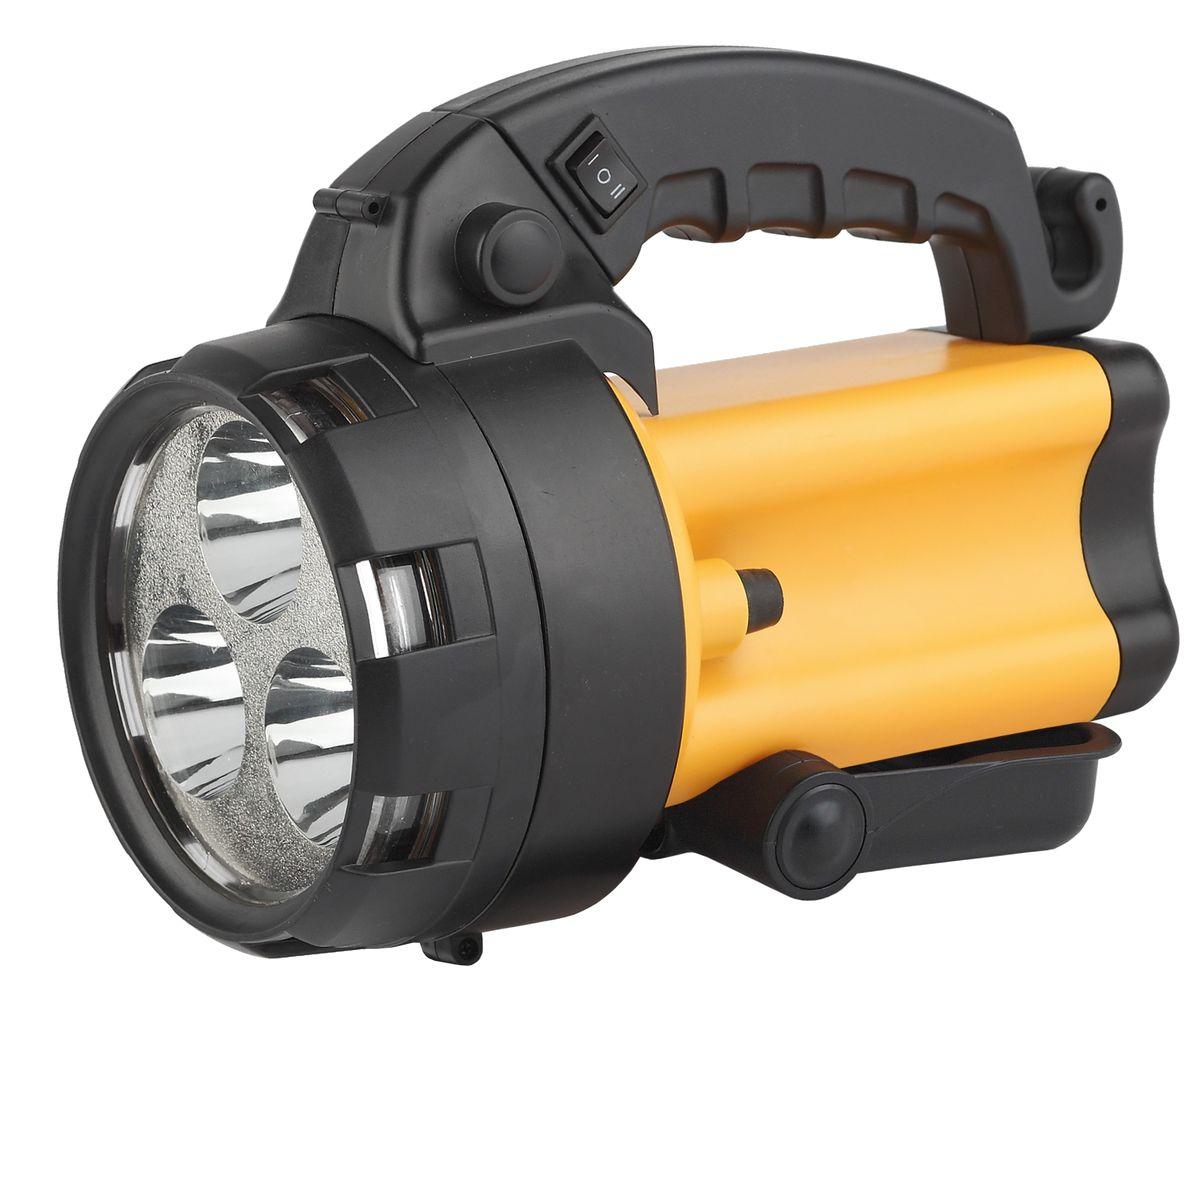 Фонарь ручной Эра, 3 x 1 Вт LED SMD, аккумулятор 4В 4,5Ач, ЗУ 220V+12V фонарь кемпинговый эра 10 smd 1w аккумулятор 4v 900mah зу 220v